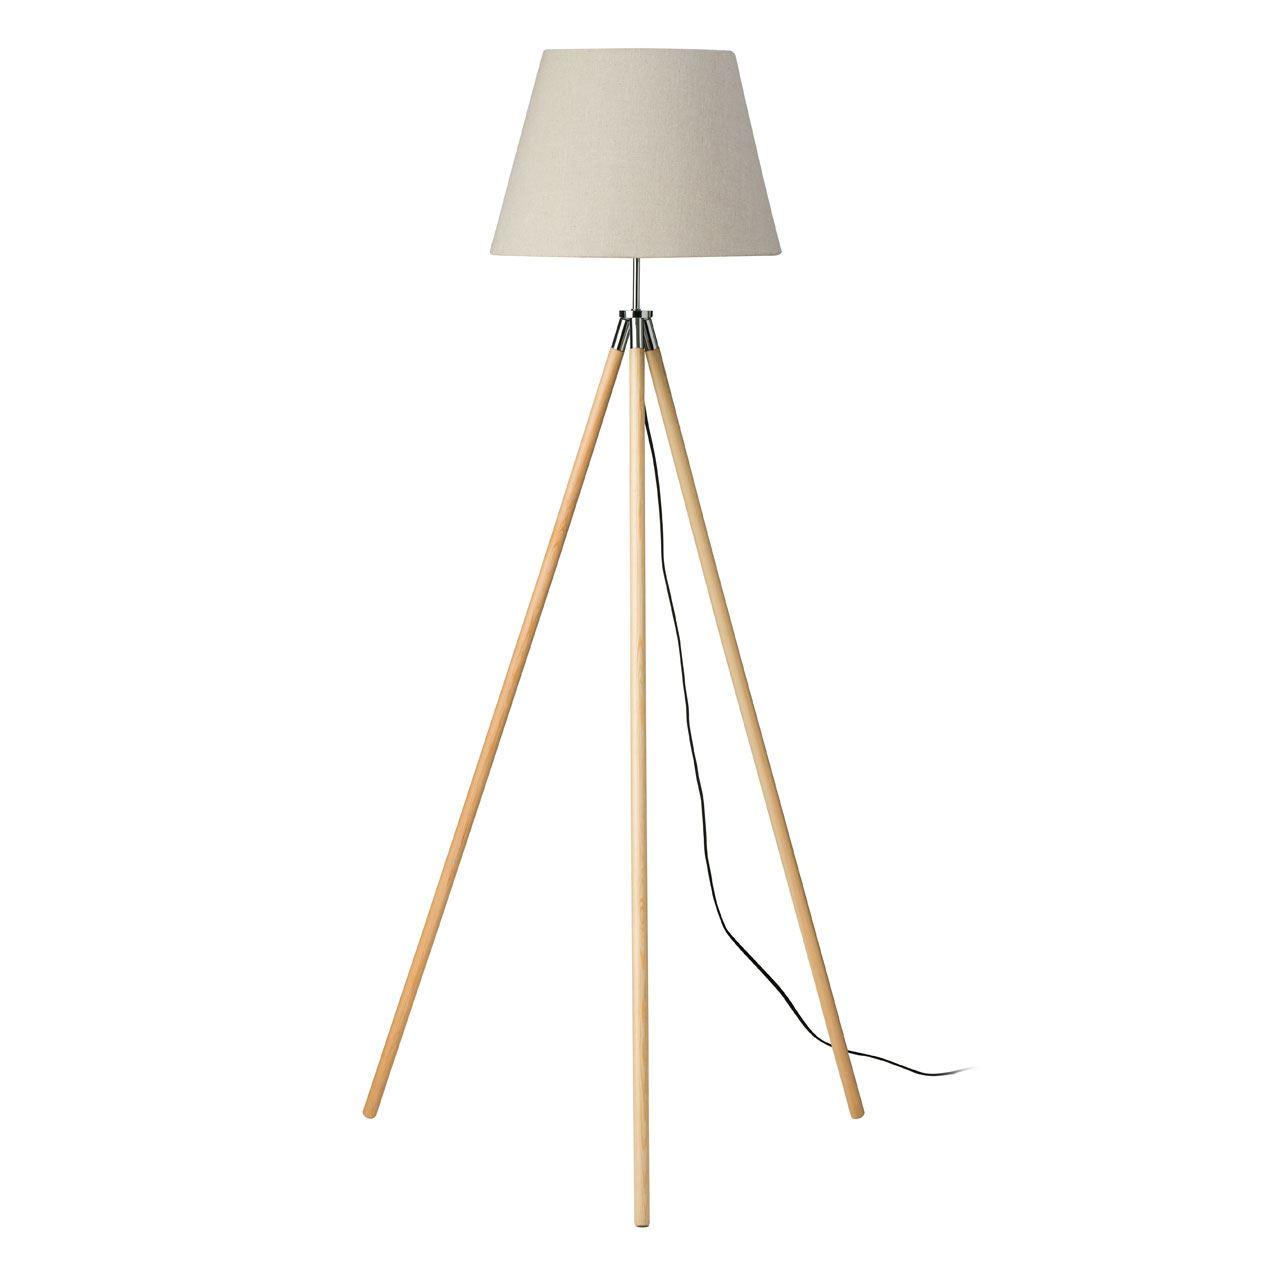 Stockholm Floor Lamp, Light Wood Tripod Base, Flax Fabric Shade / Eu Plug